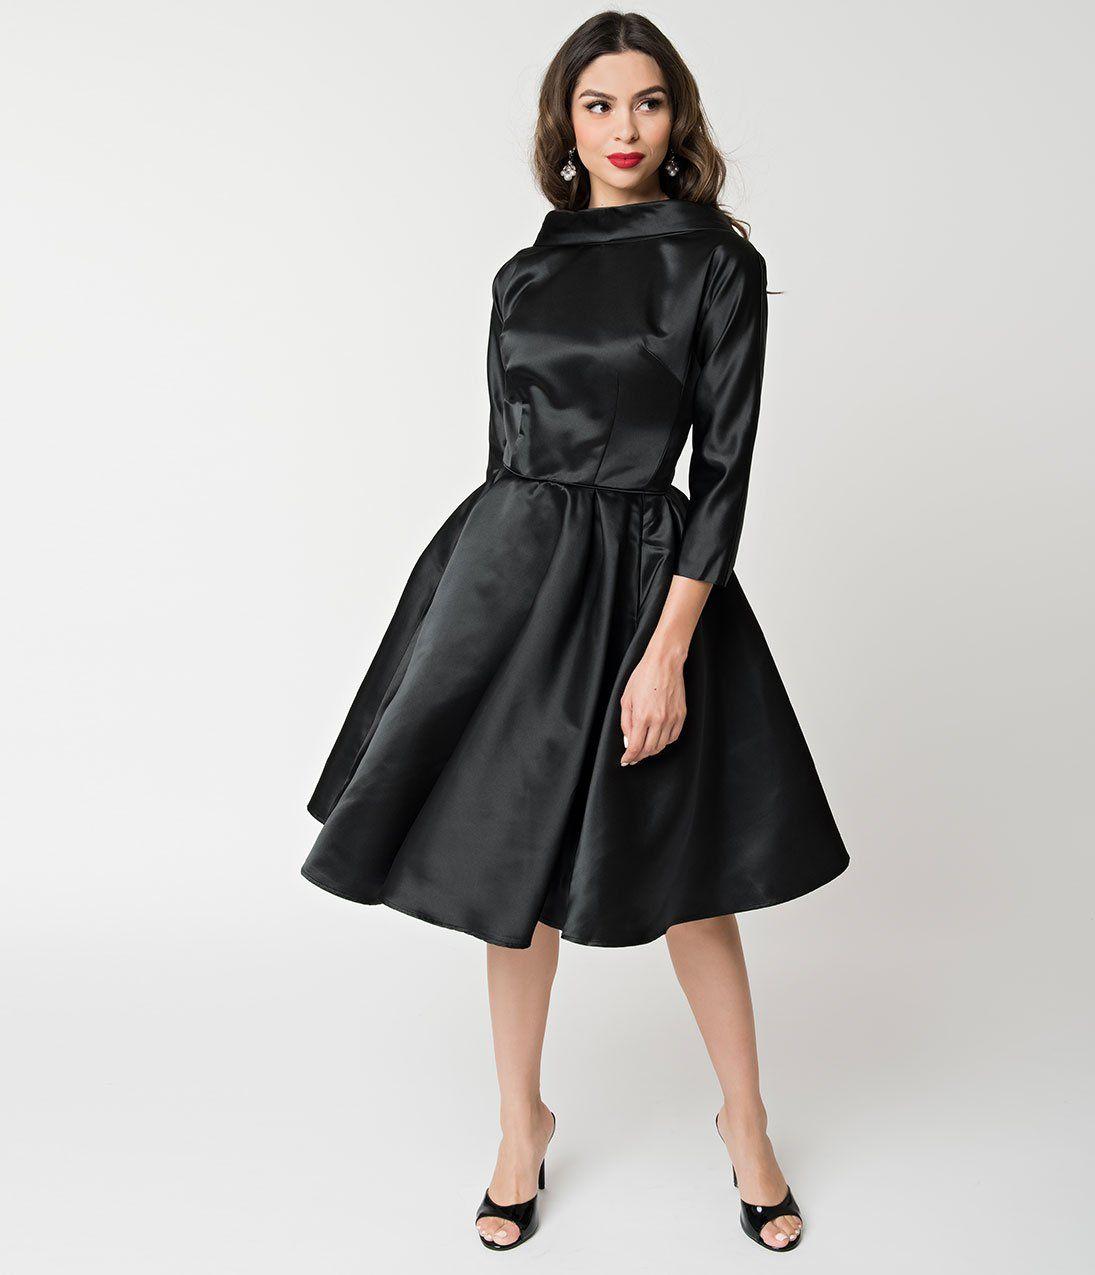 1950s Bridesmaid Dresses 50s Bridesmaid Dresses Sixties Fashion Vintage Dresses Online Black Swing Dress [ 1275 x 1095 Pixel ]